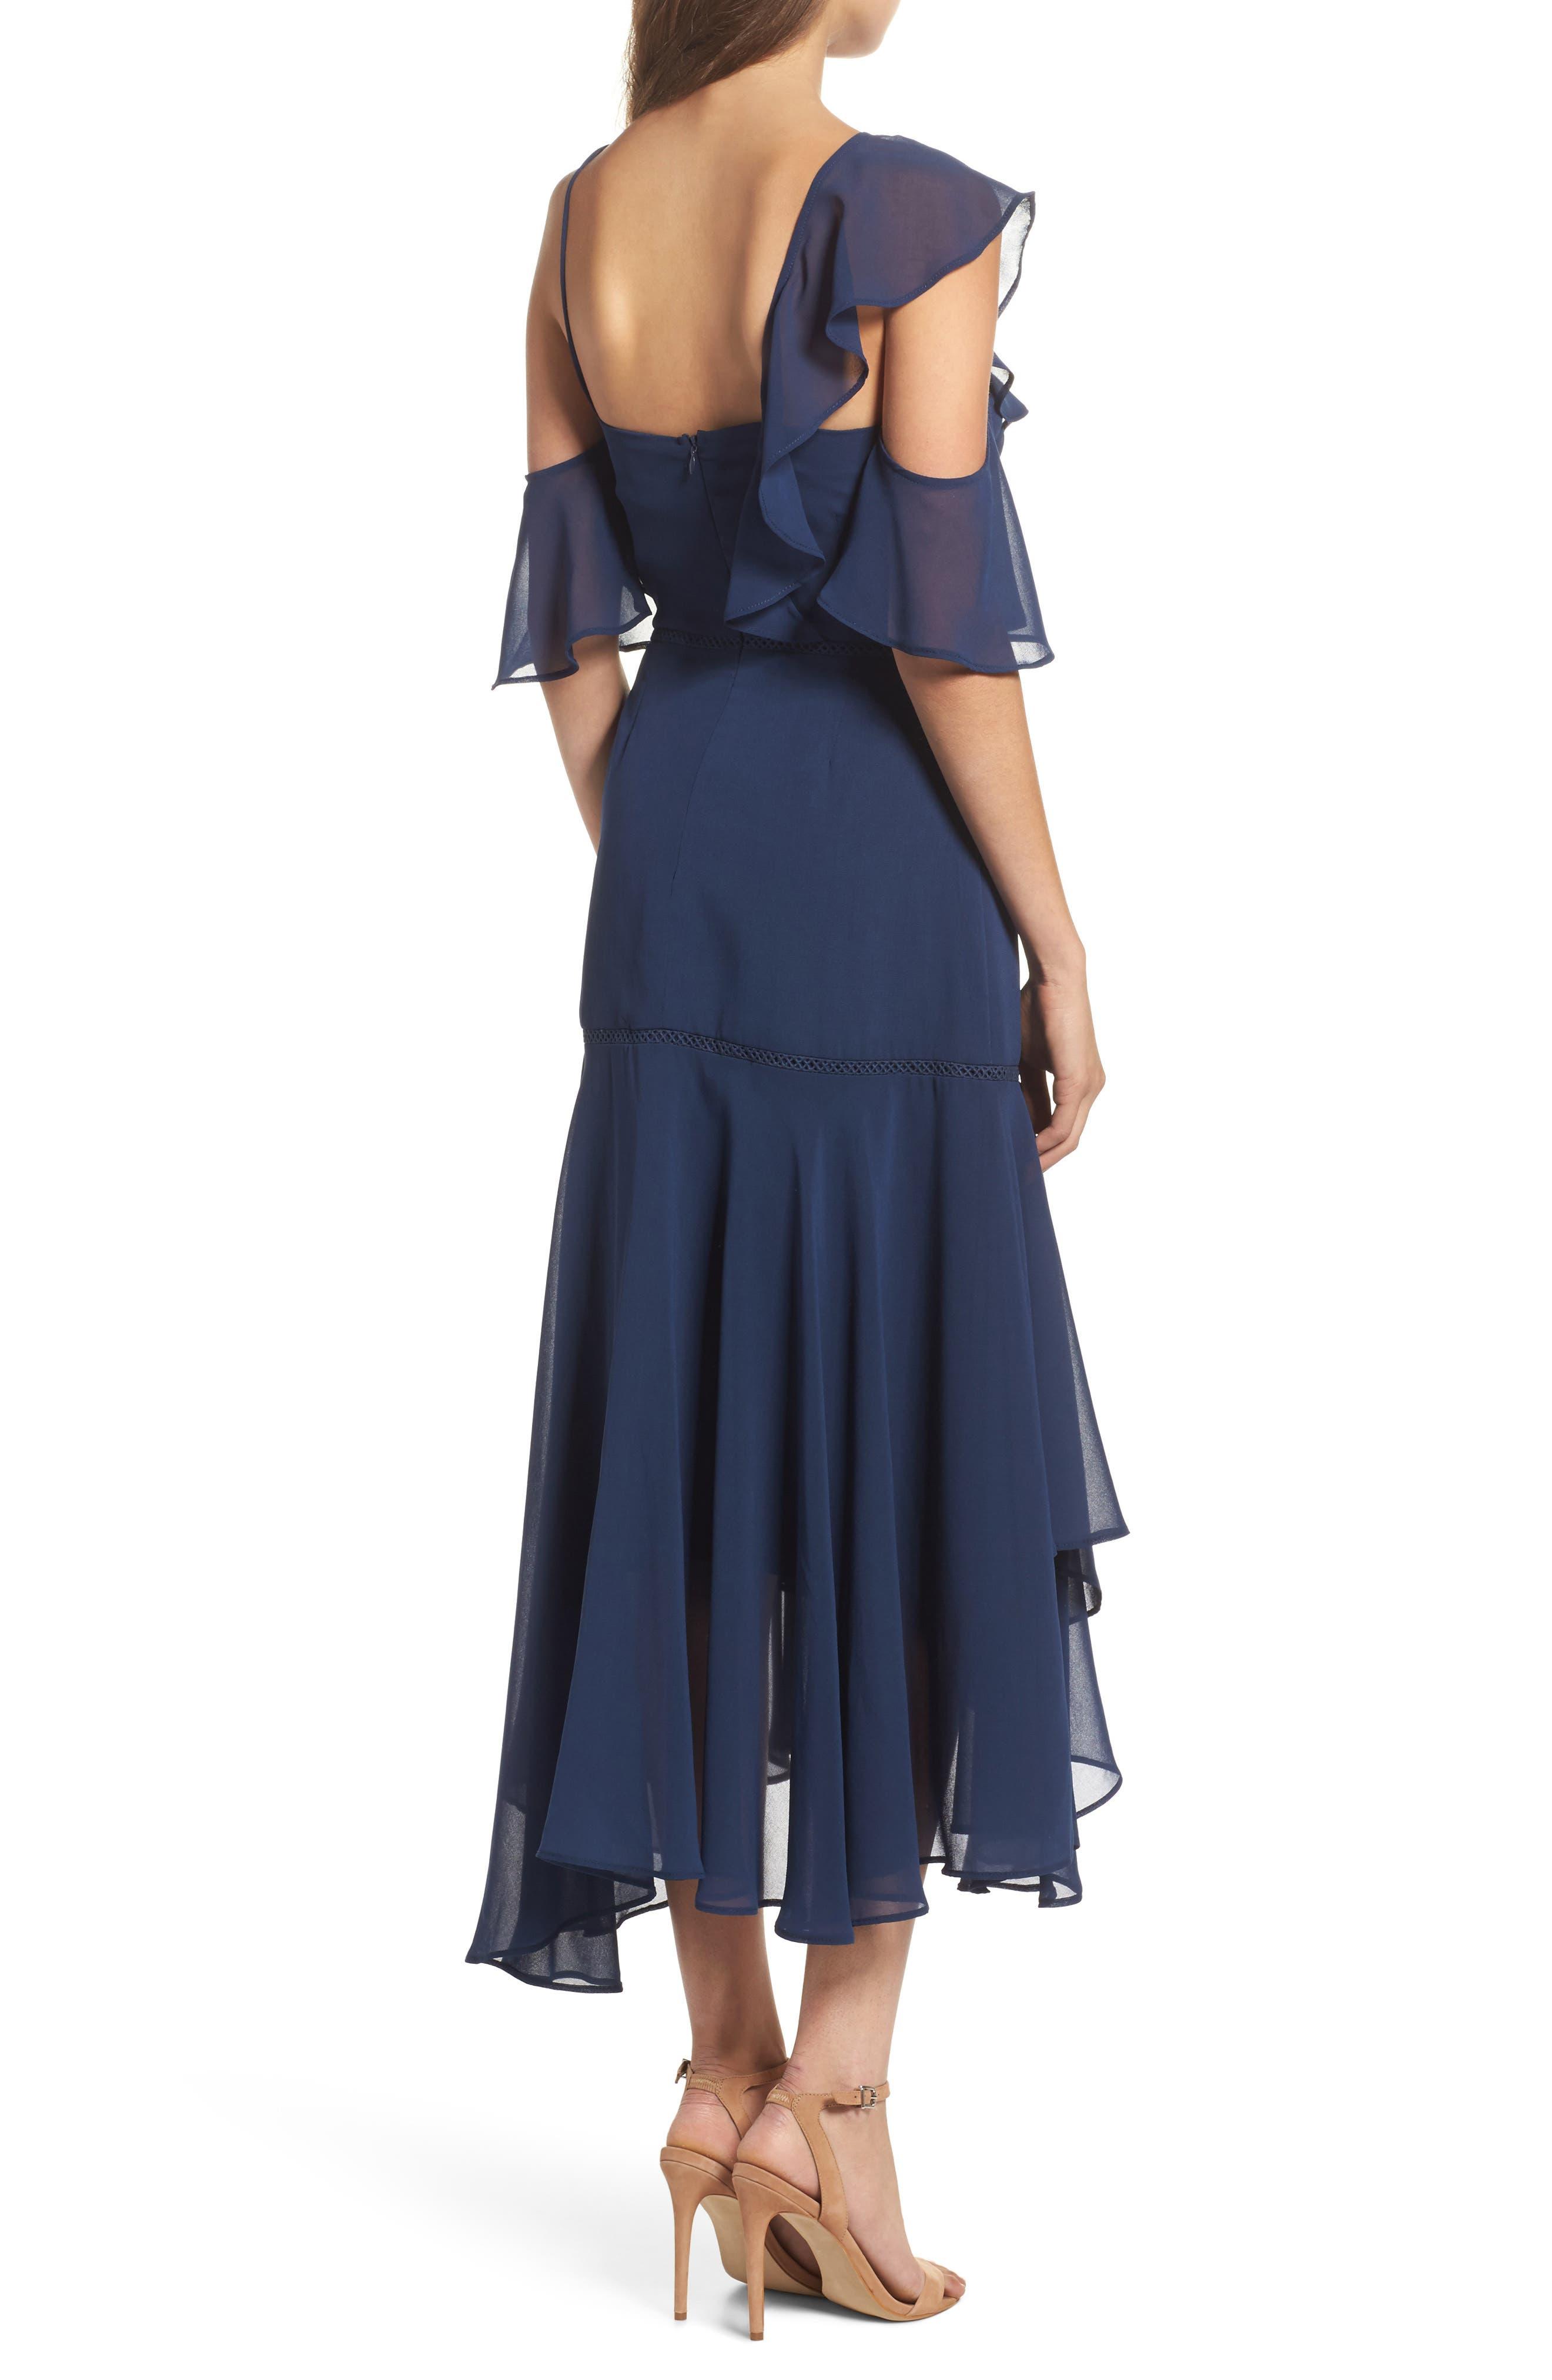 Utopia Cold Shoulder Midi Dress,                             Alternate thumbnail 2, color,                             435